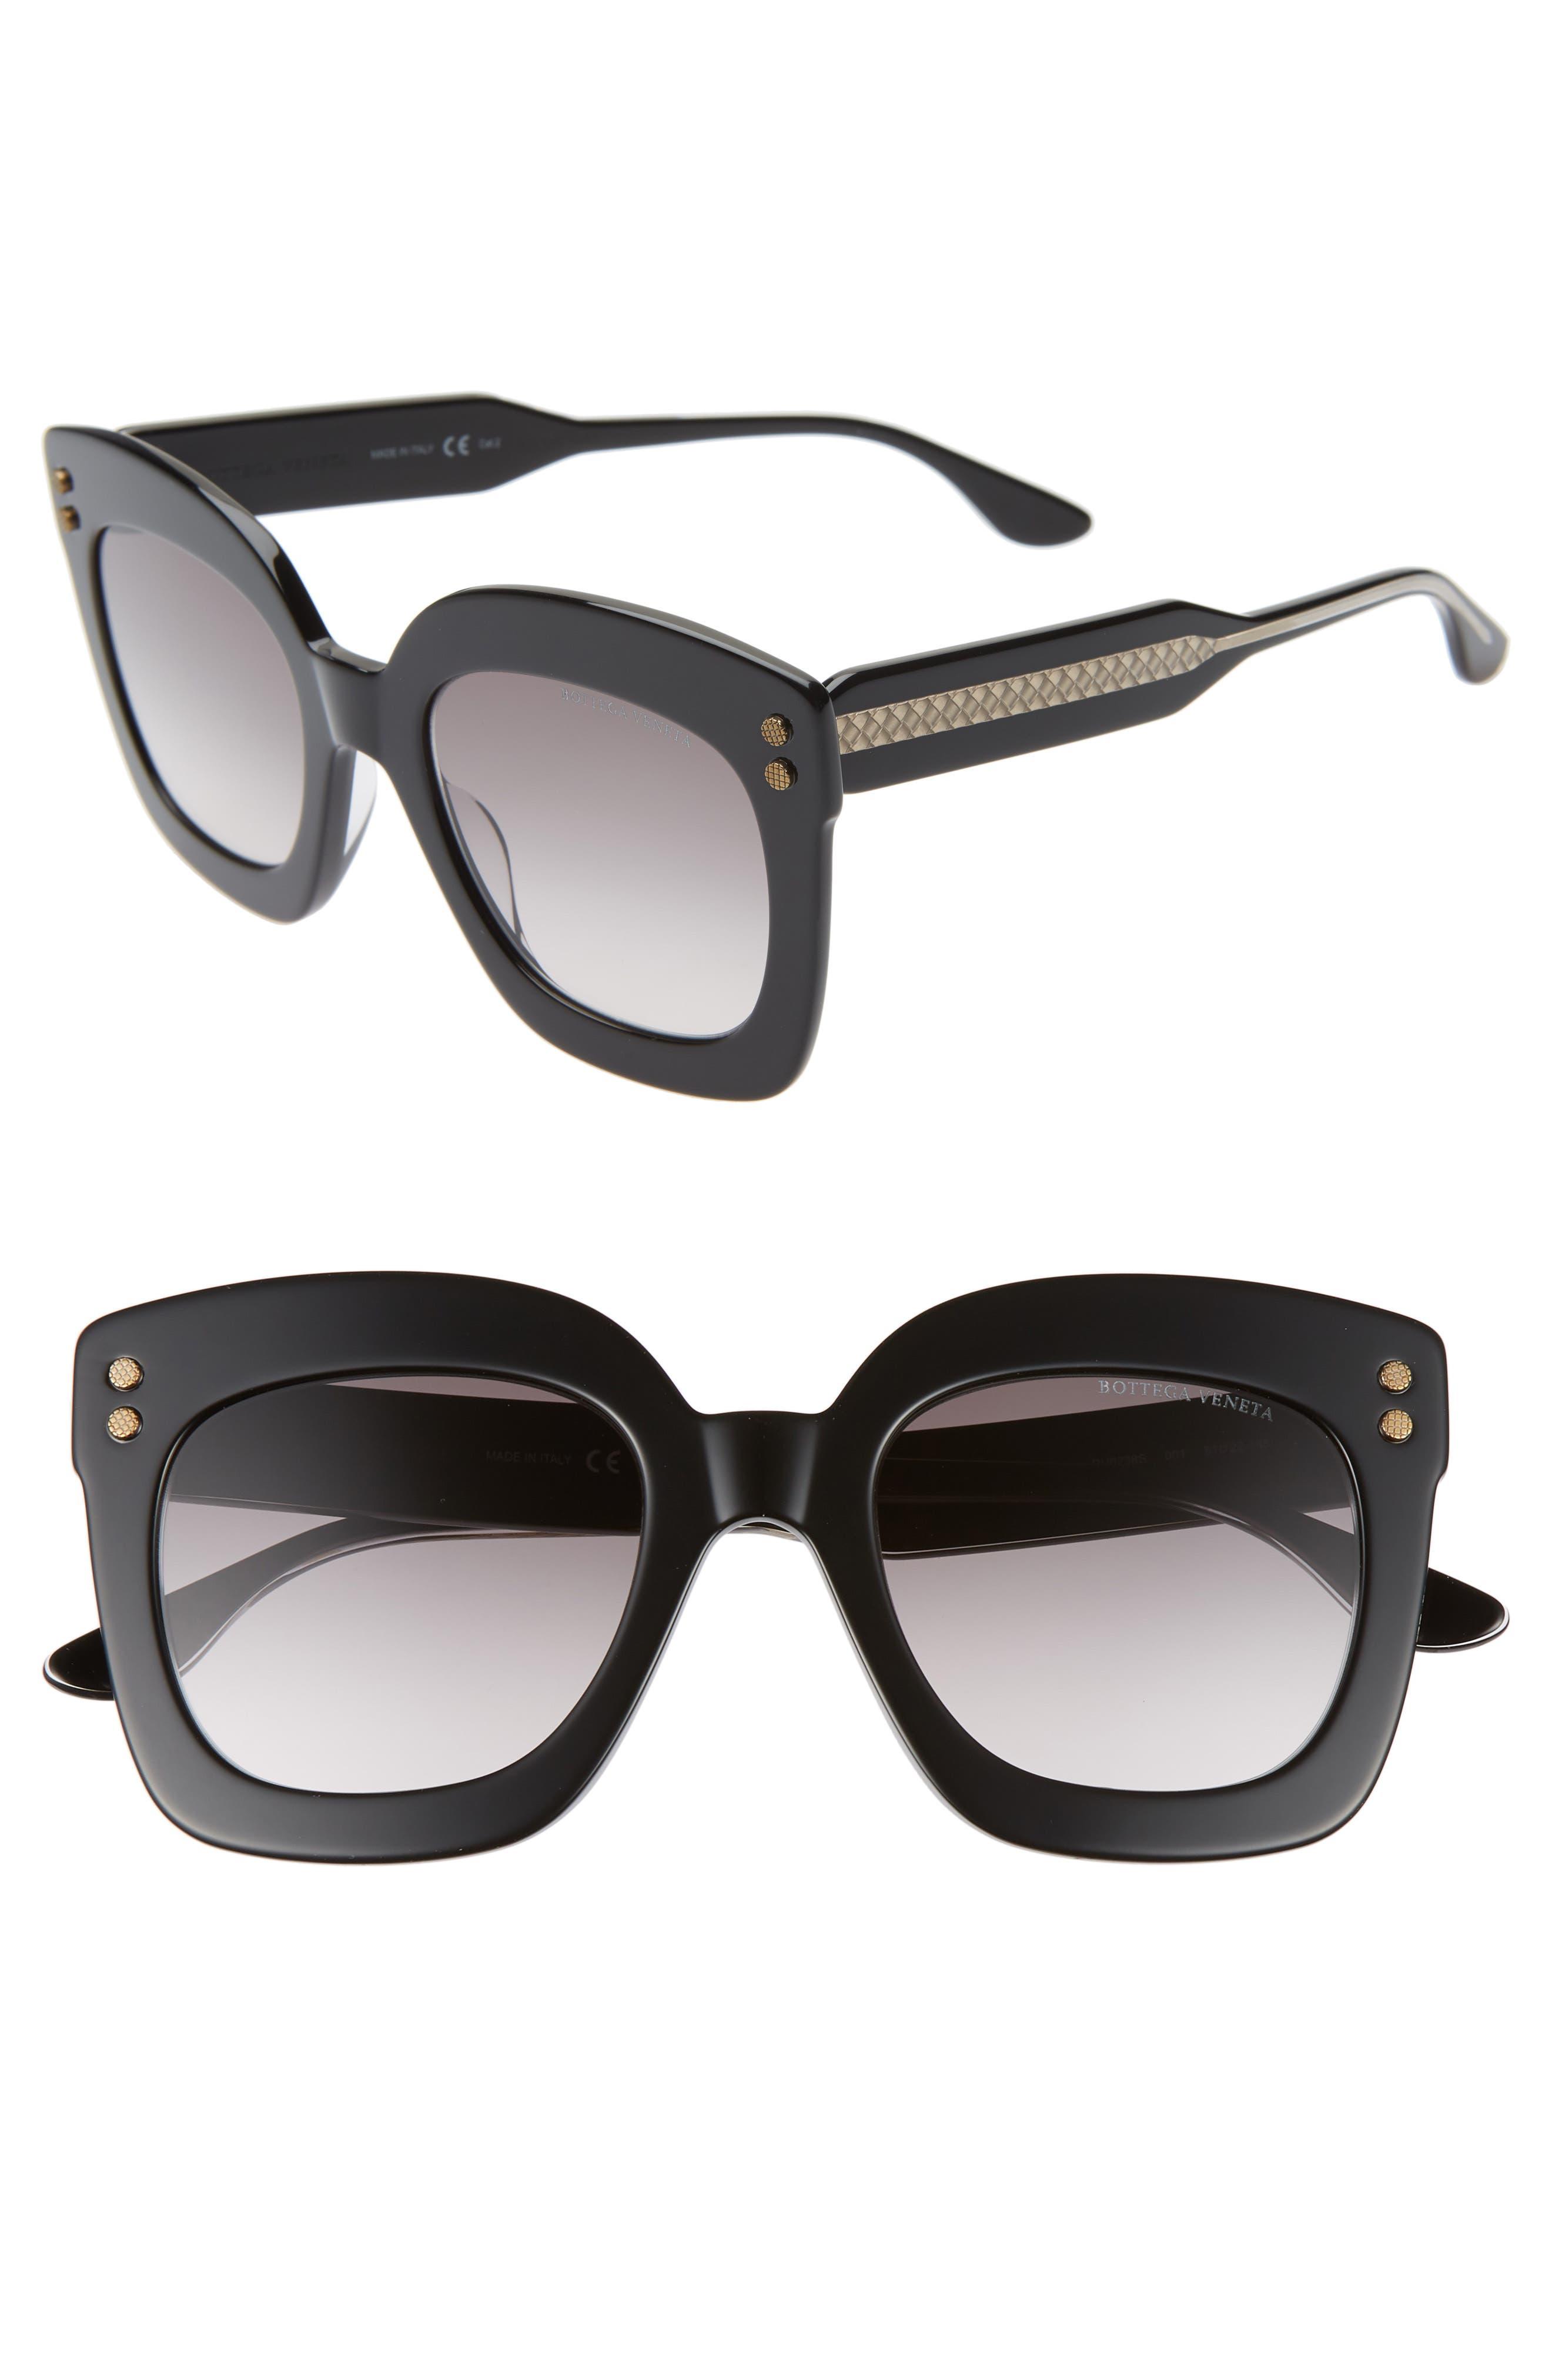 Bottega Veneta 51Mm Gradient Square Sunglasses - Black/ Grey